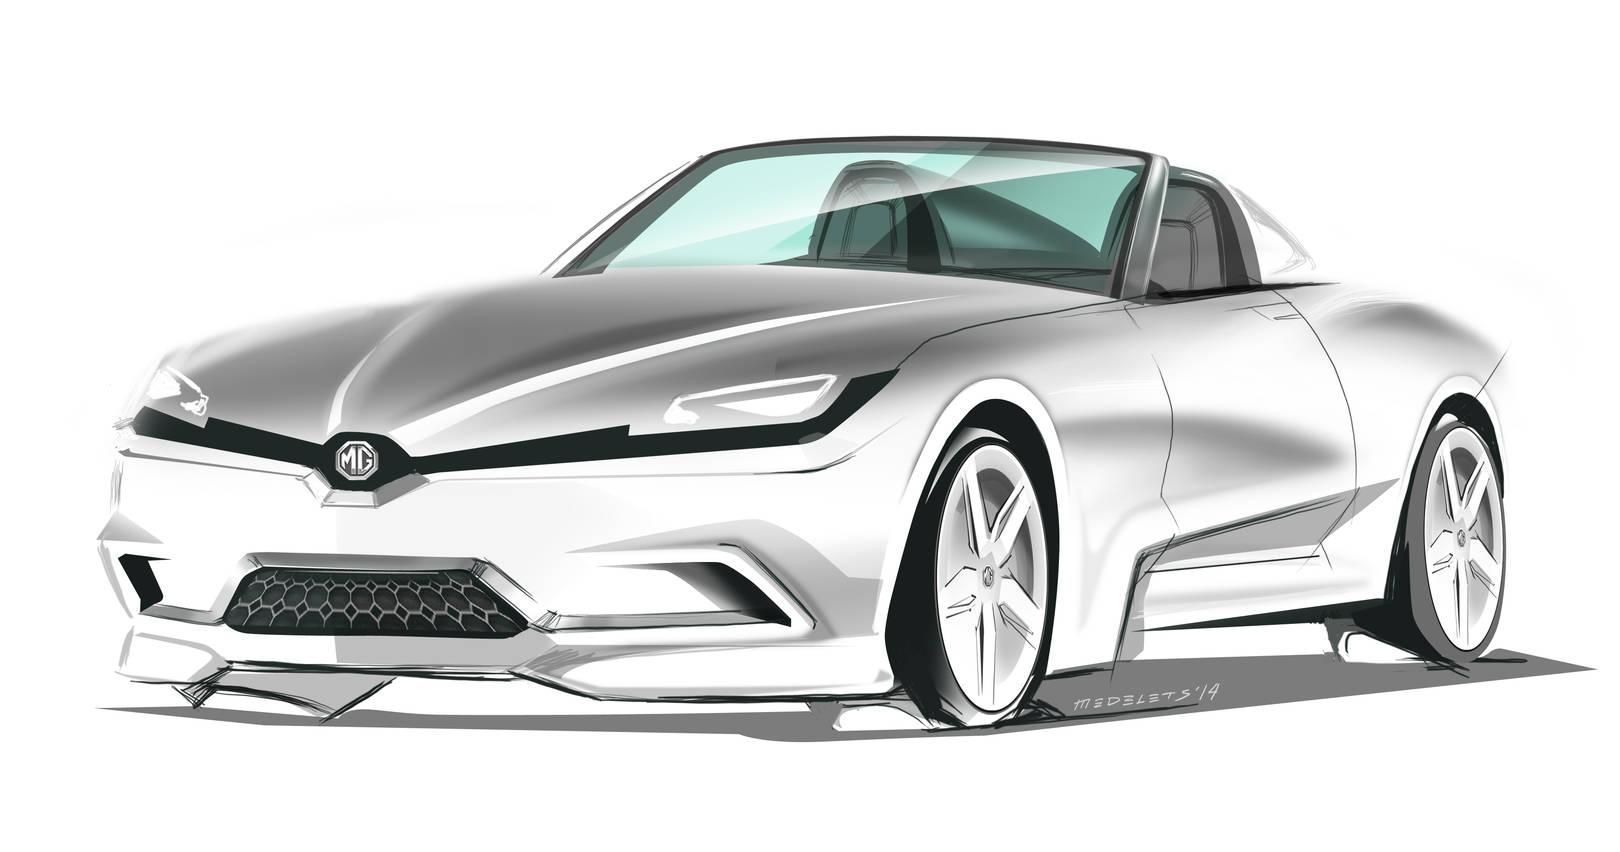 MG Roadster Sketch Fighter SPD 2014